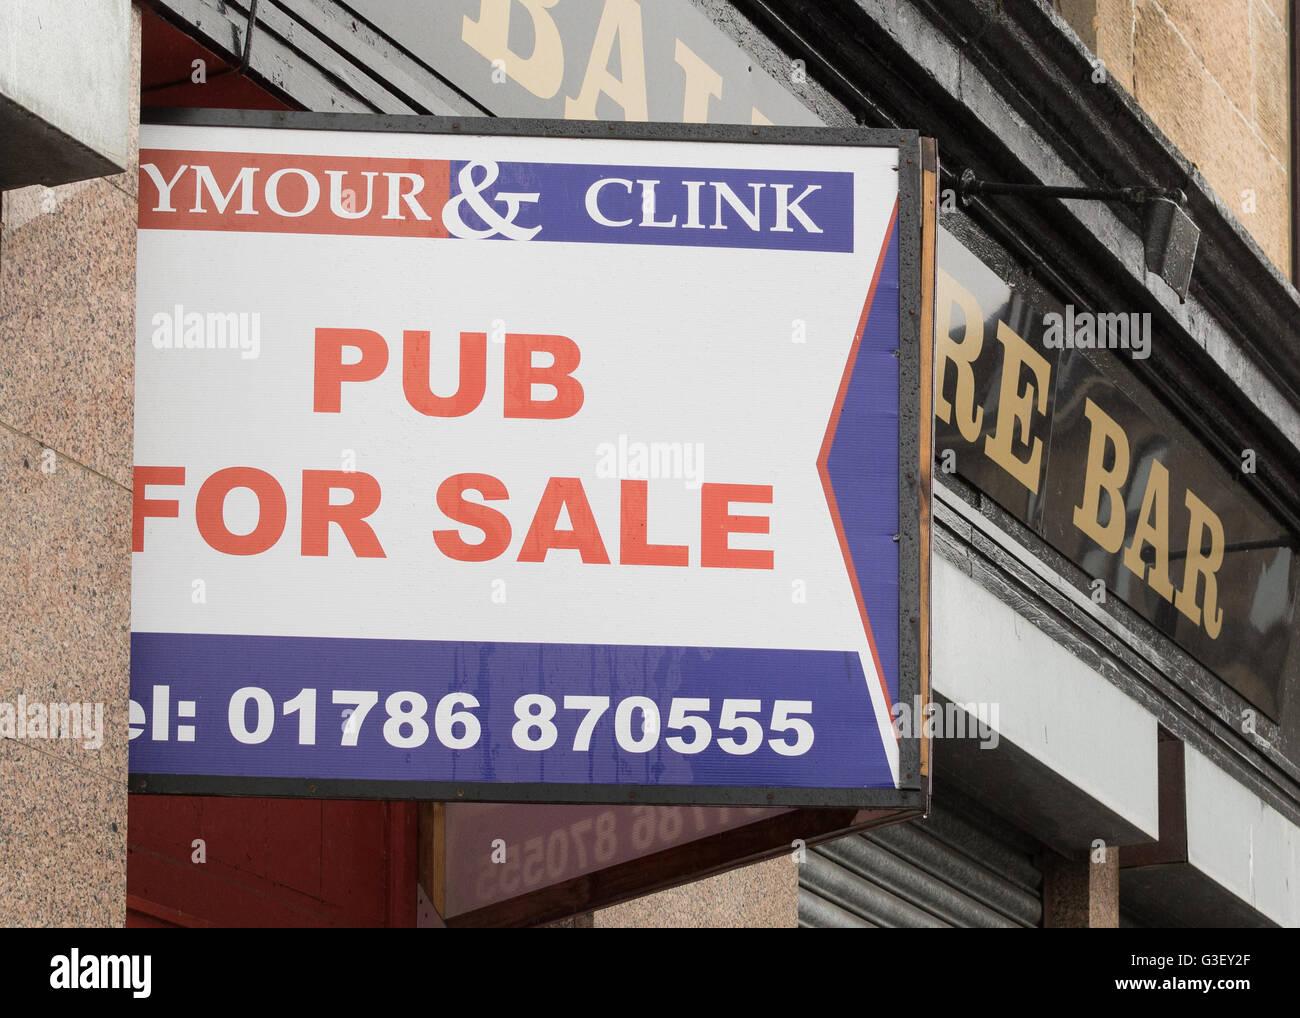 Pub for Sale sign - outside the Balmore Bar, Possilpark, Glasgow, Scotland, UK - Stock Image